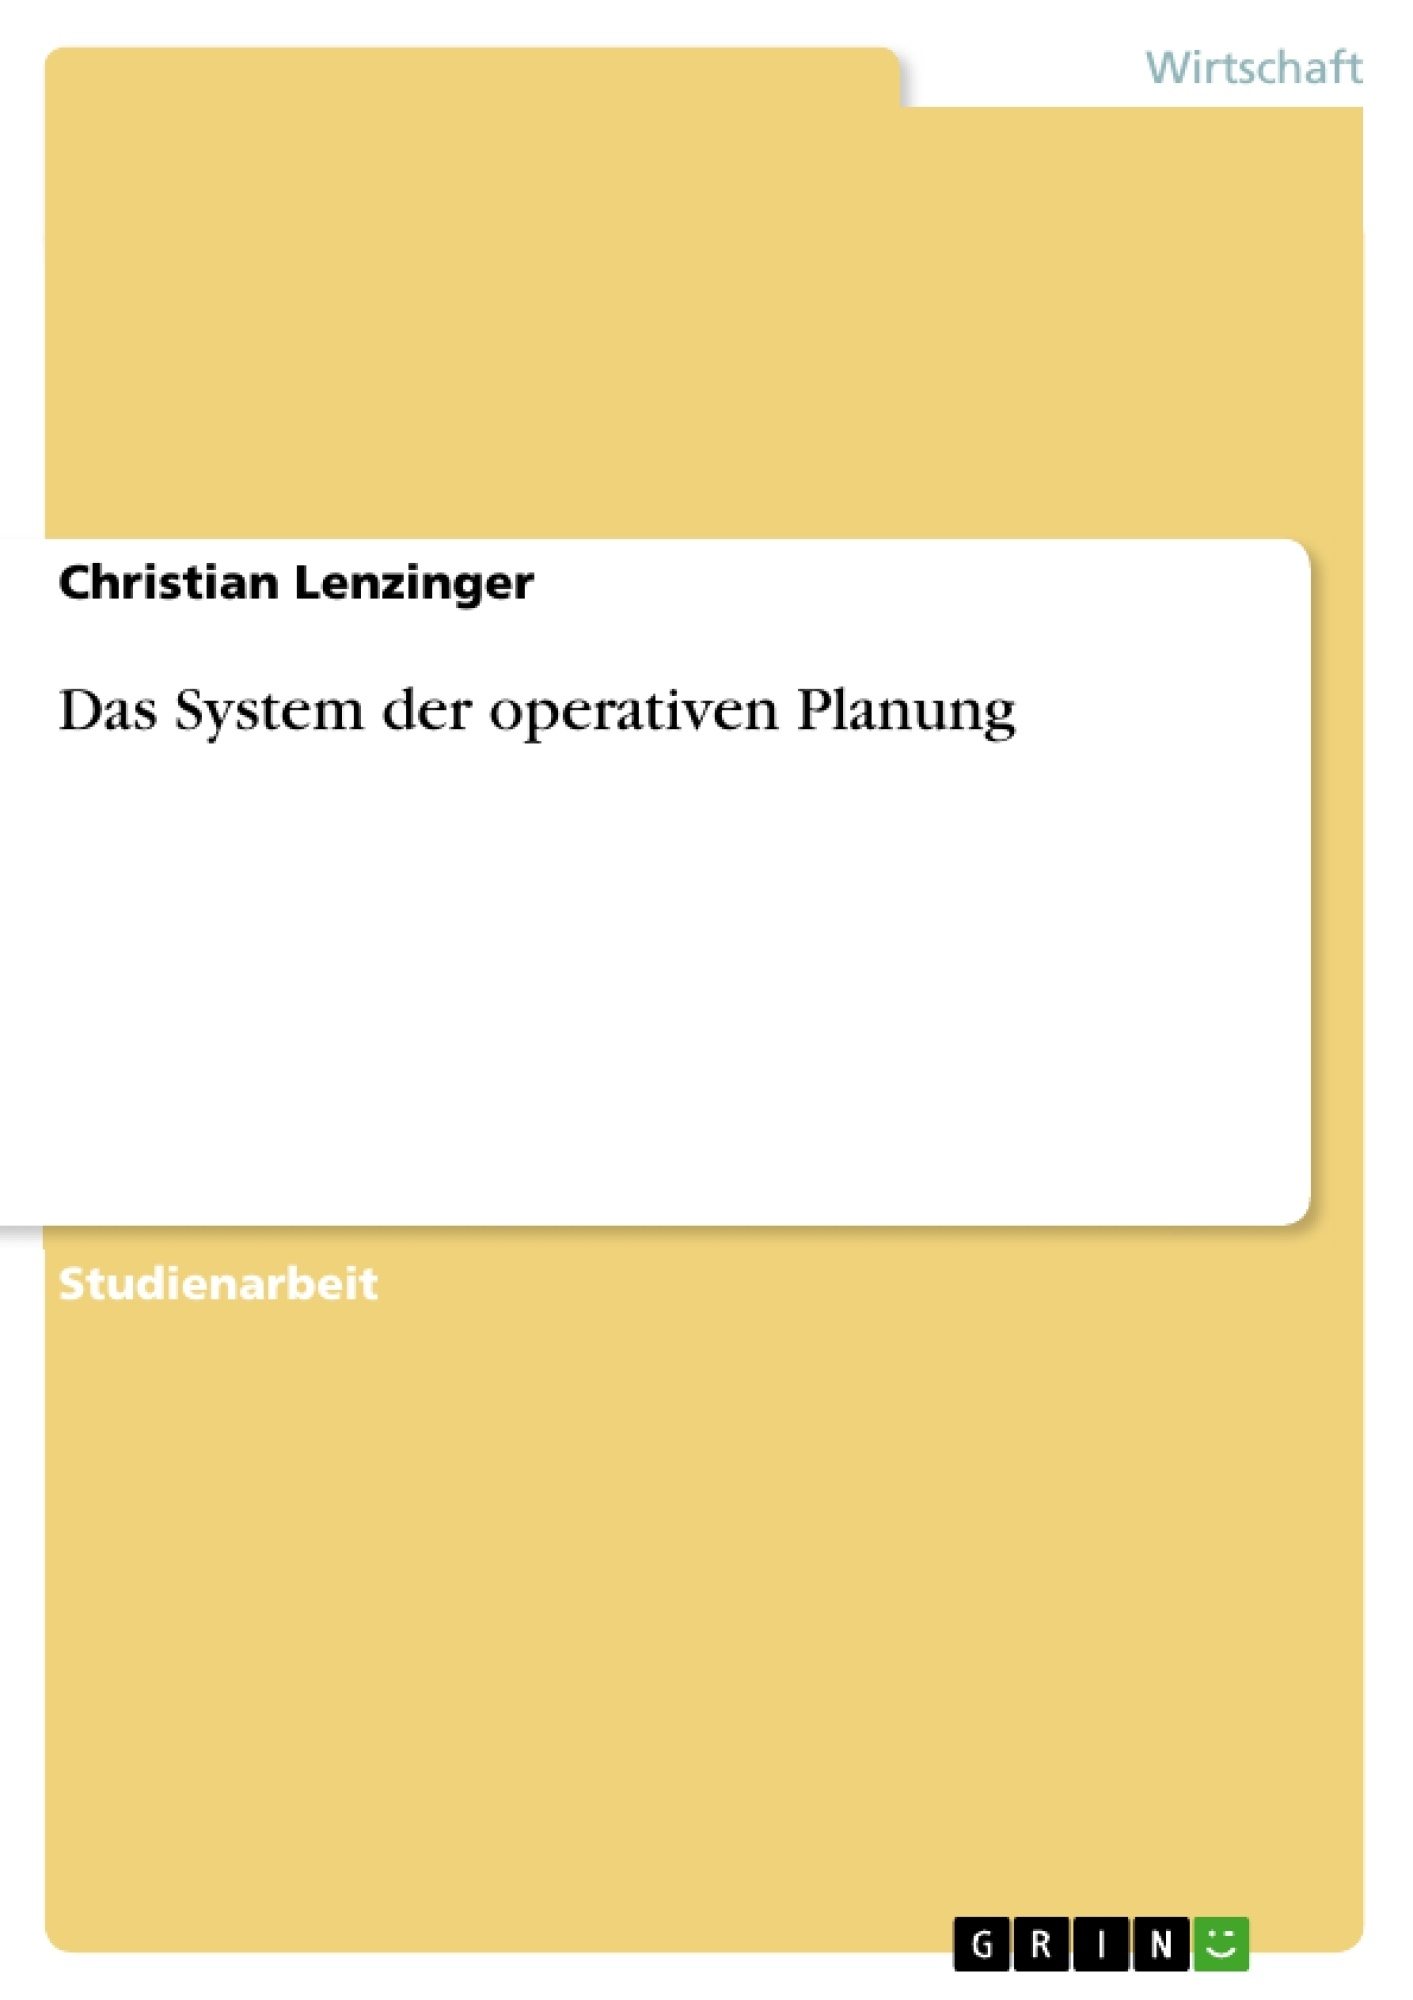 Titel: Das System der operativen Planung